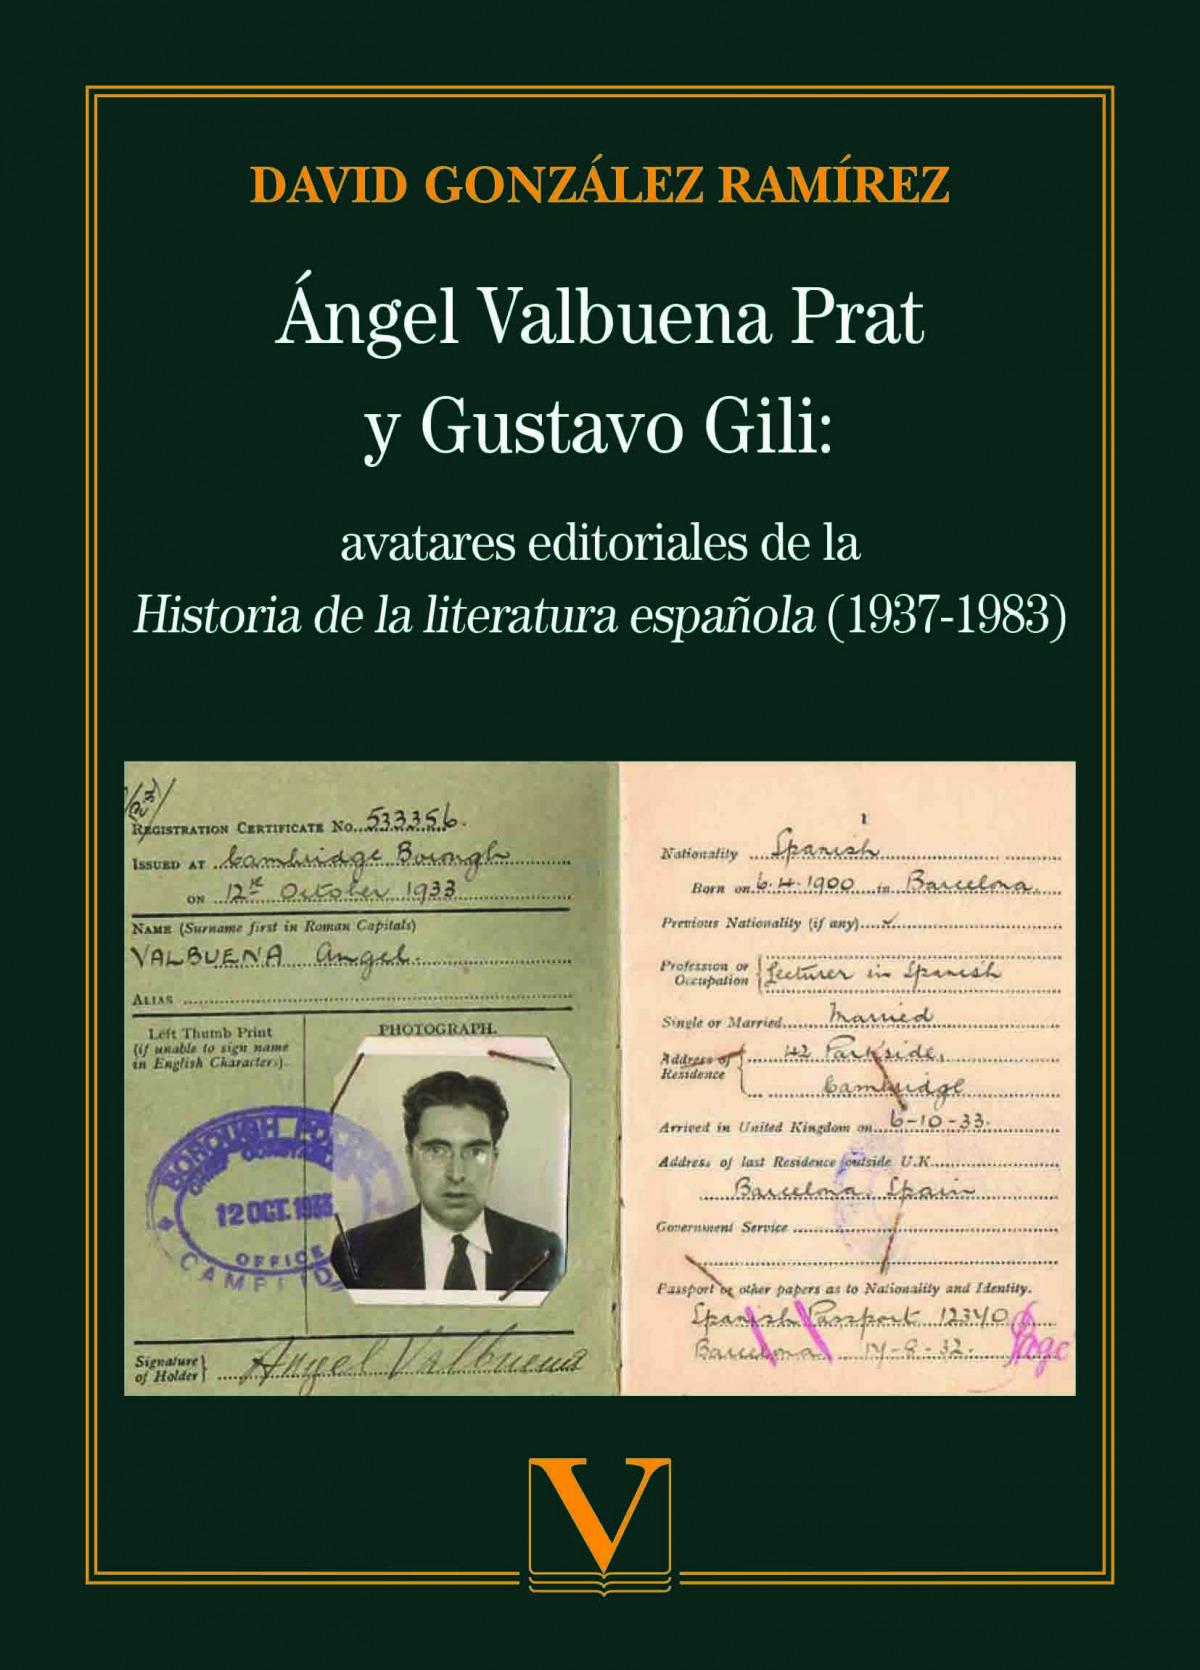 Ángel Valbuena y Gustavo Gili: